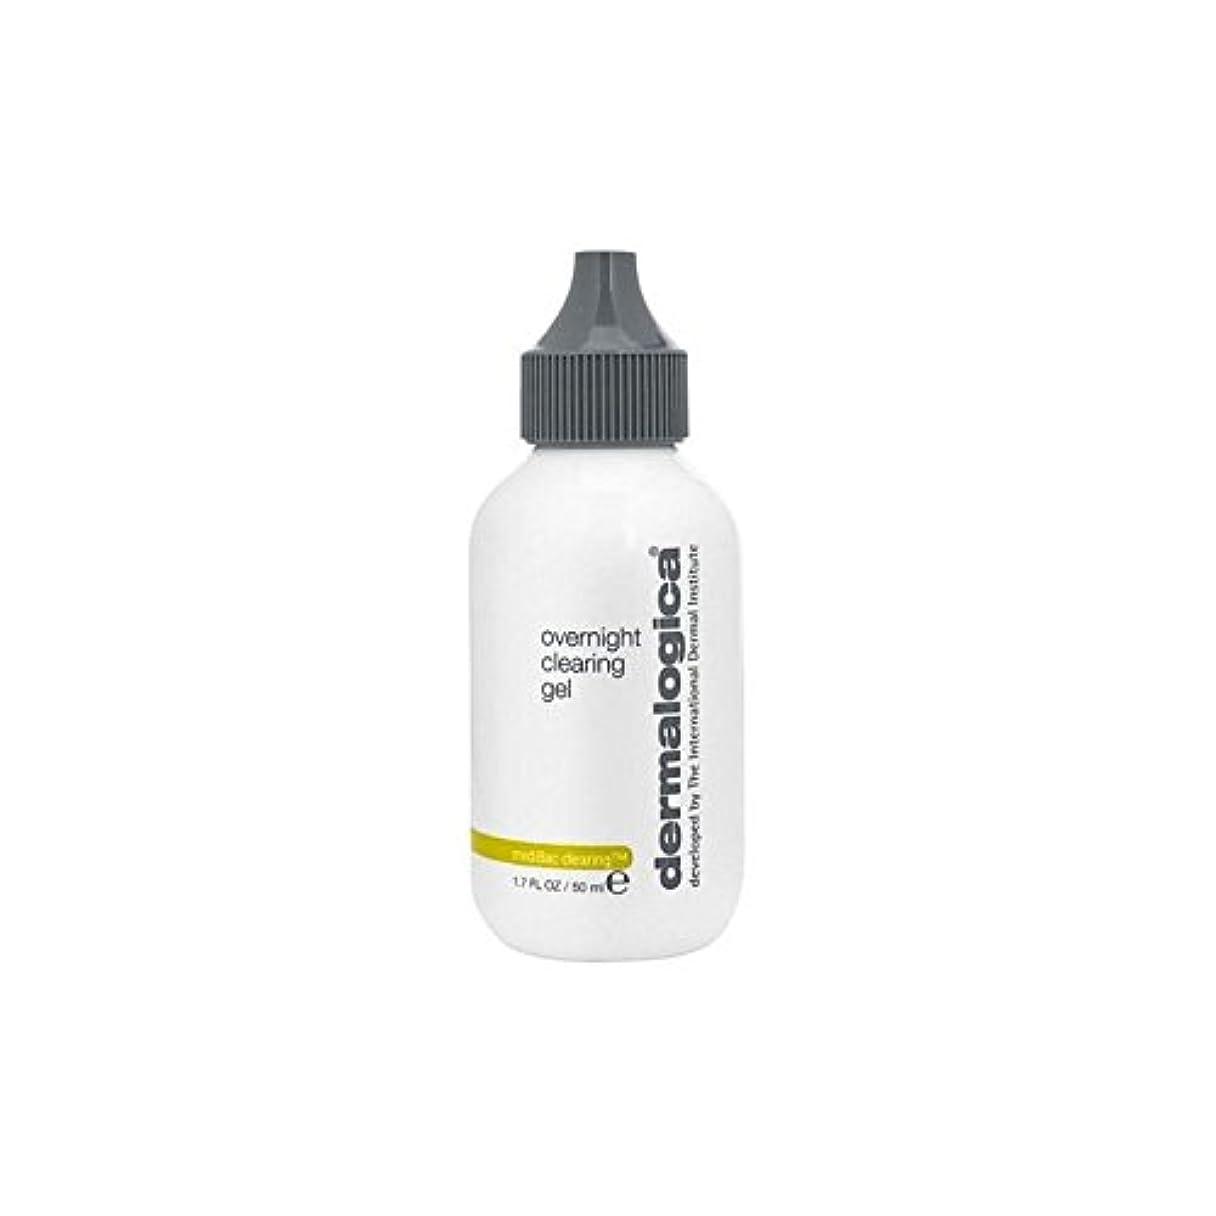 Dermalogica Medibac Overnight Clearing Gel (50ml) (Pack of 6) - ダーマロジカ一晩透明ゲル(50)中 x6 [並行輸入品]